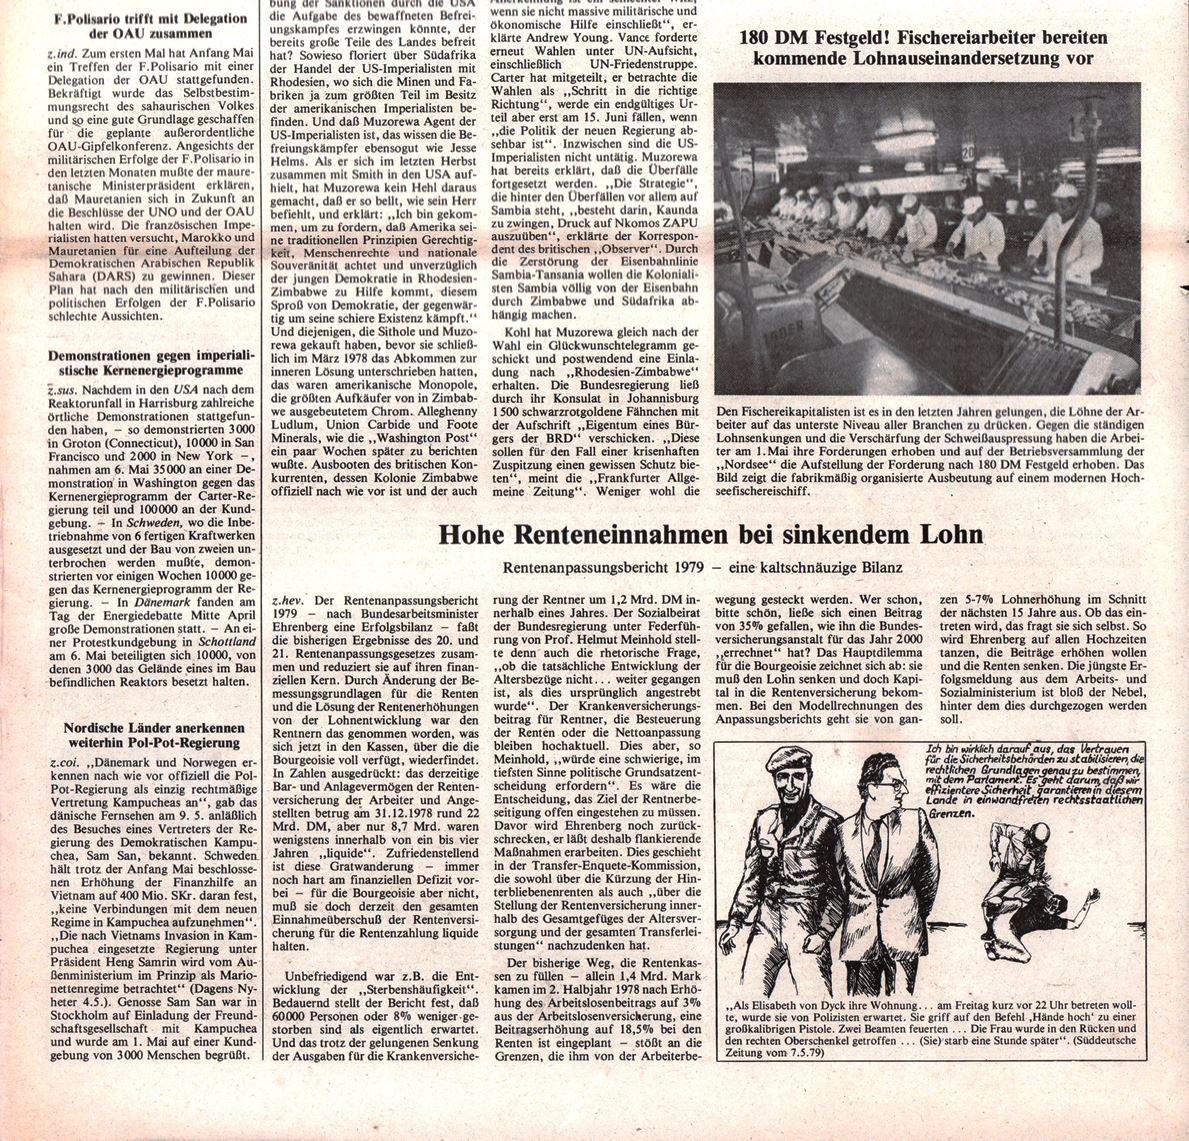 Hamburg_KVZ_1979_20_02